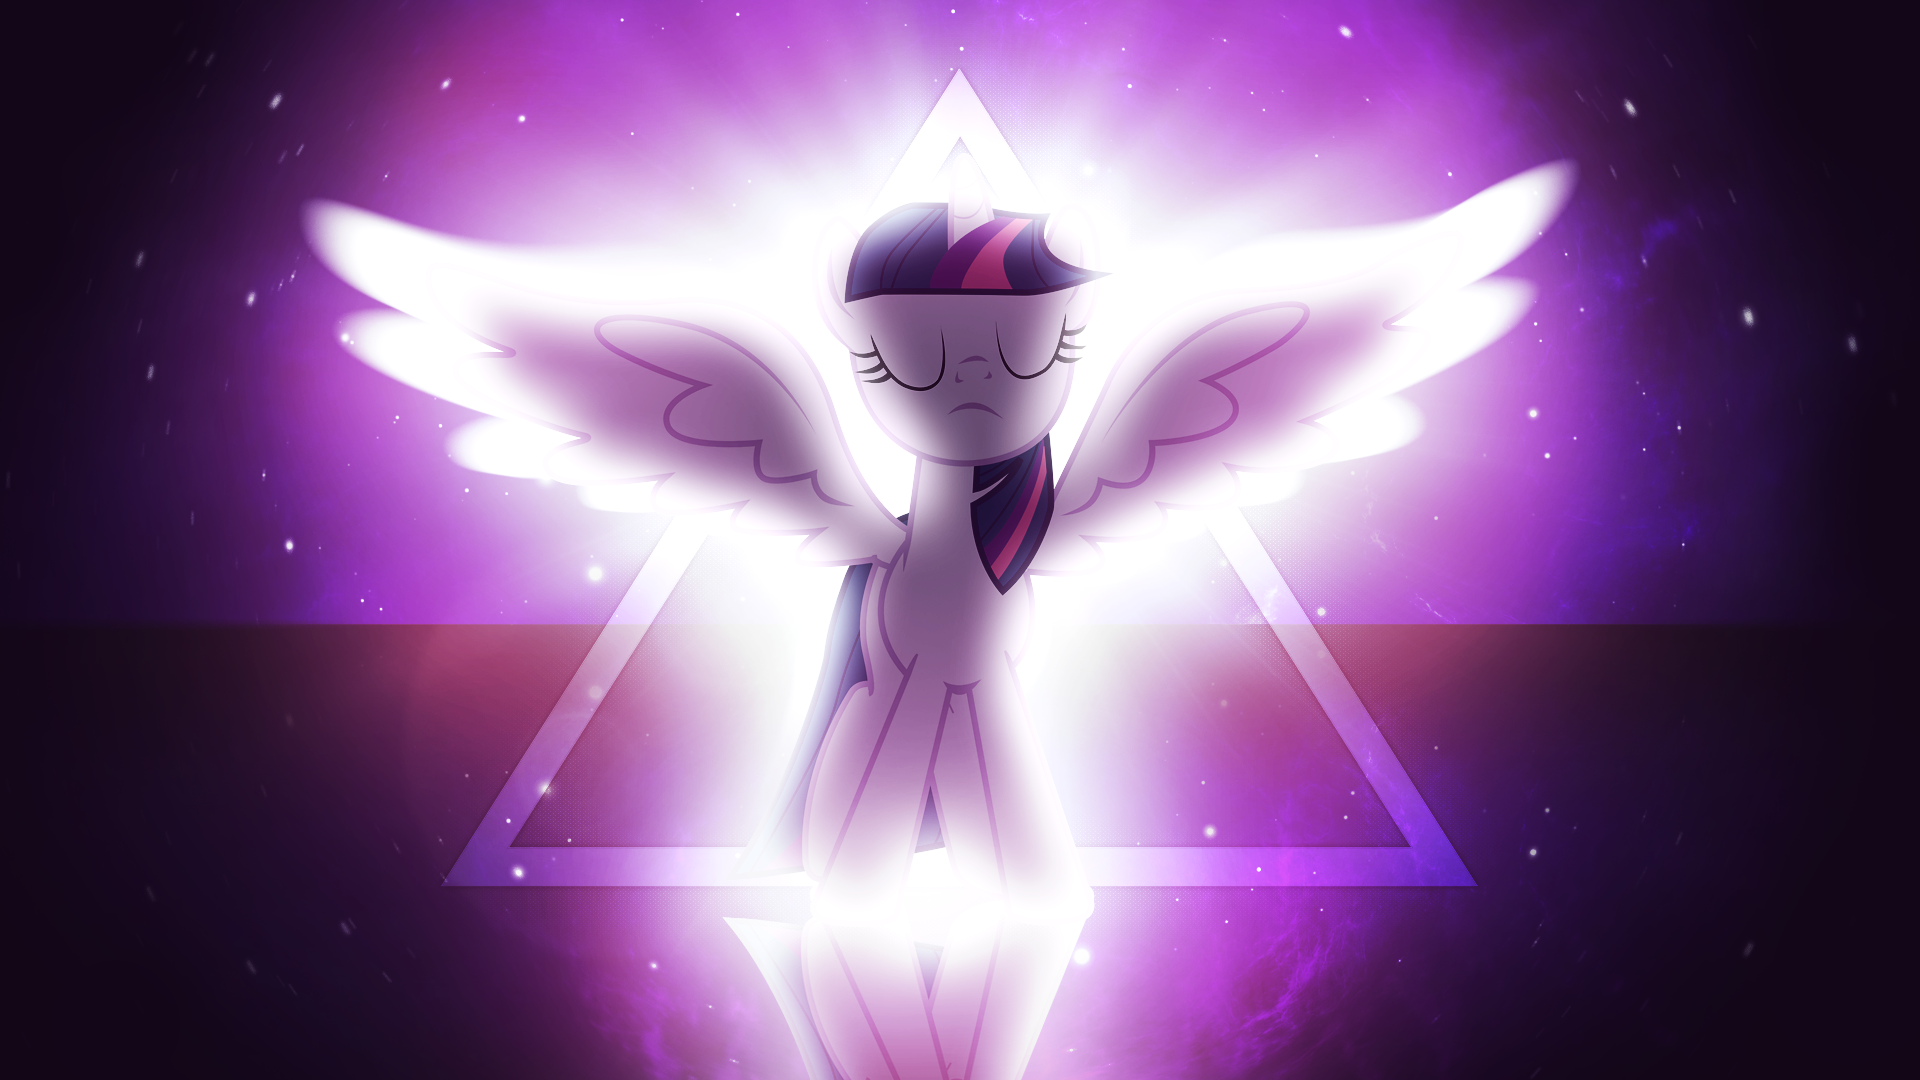 Alicorn Twilight Sparkle Wallpaper By Artist Moldypotato